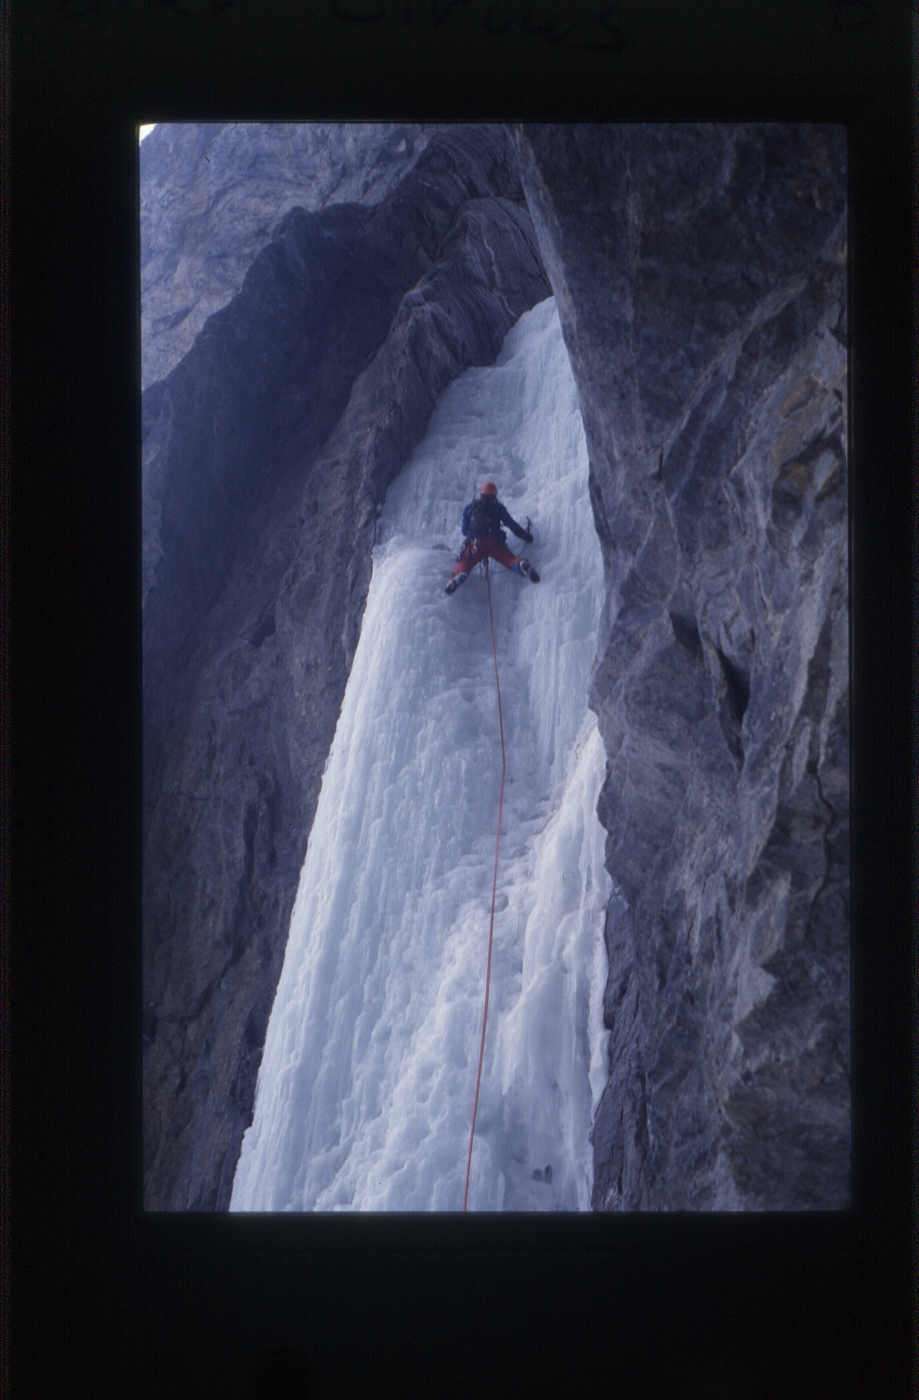 Ken Wylie leading on Polar Circus. February 1985 Photo: Jeff Nazarchuk.